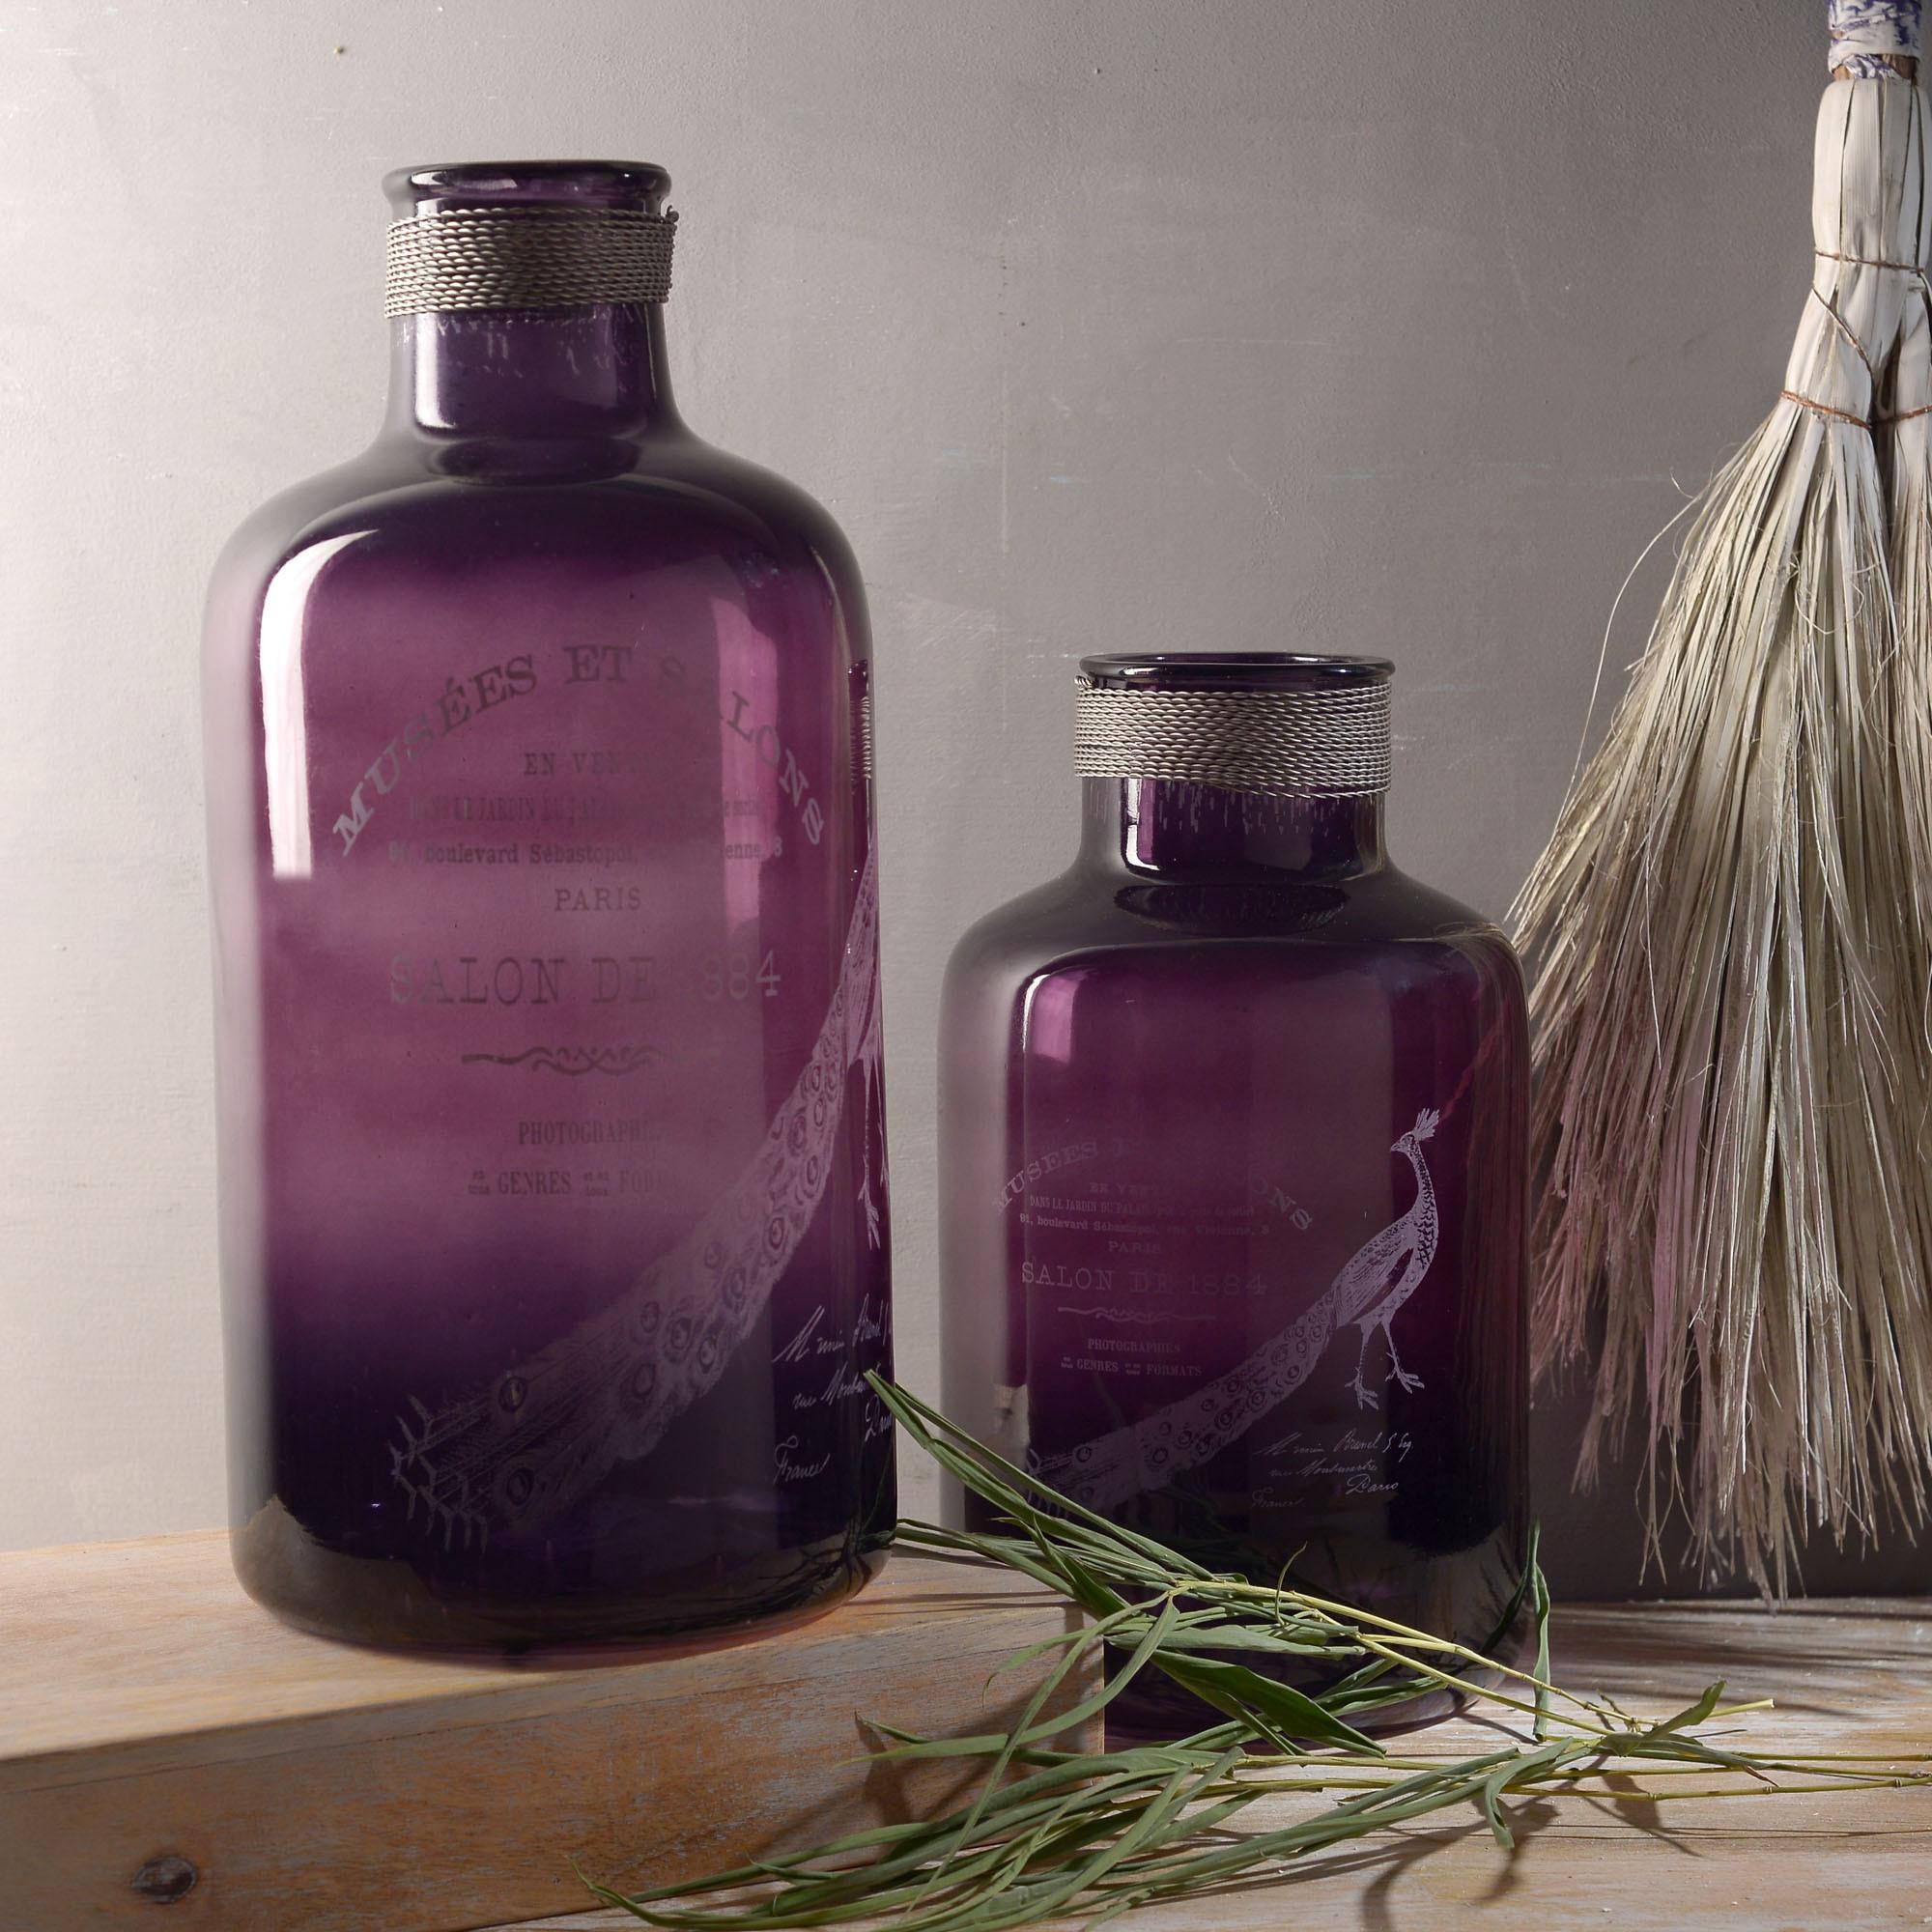 cheap glass vases by the case of purple tiffany floor lamp luxury dsc 1329h vases purple previ 0d in purple tiffany floor lamp luxury dsc 1329h vases purple previ 0d floor fenton